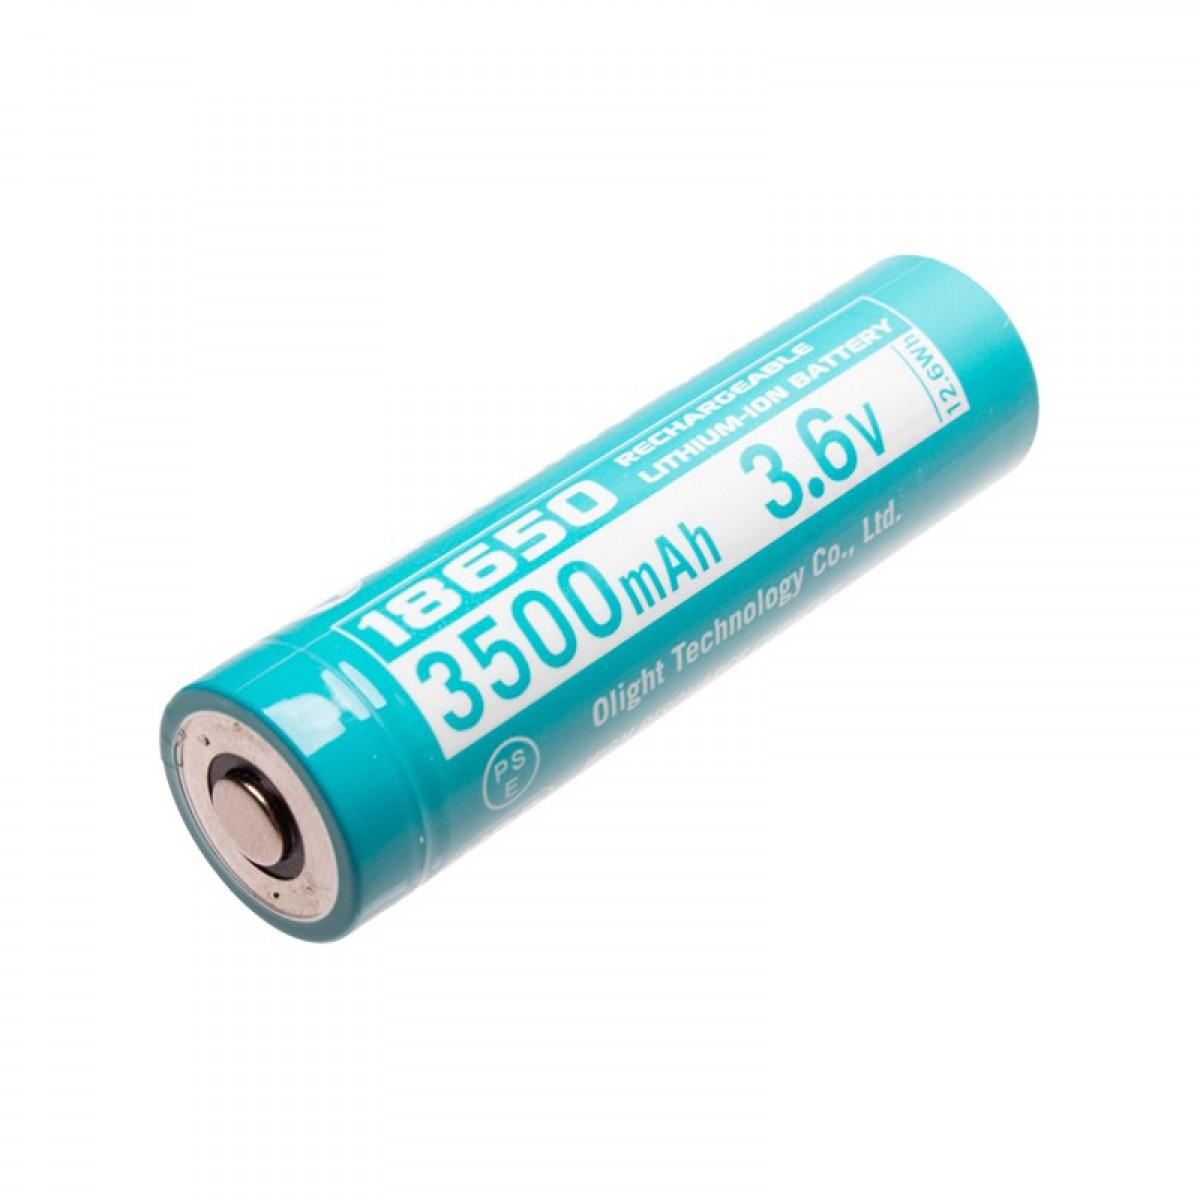 Olight Custom 18650 3.6V 3500mAh HDC 10A Protected Rechargeable Li-ion Battery ORB-186C35